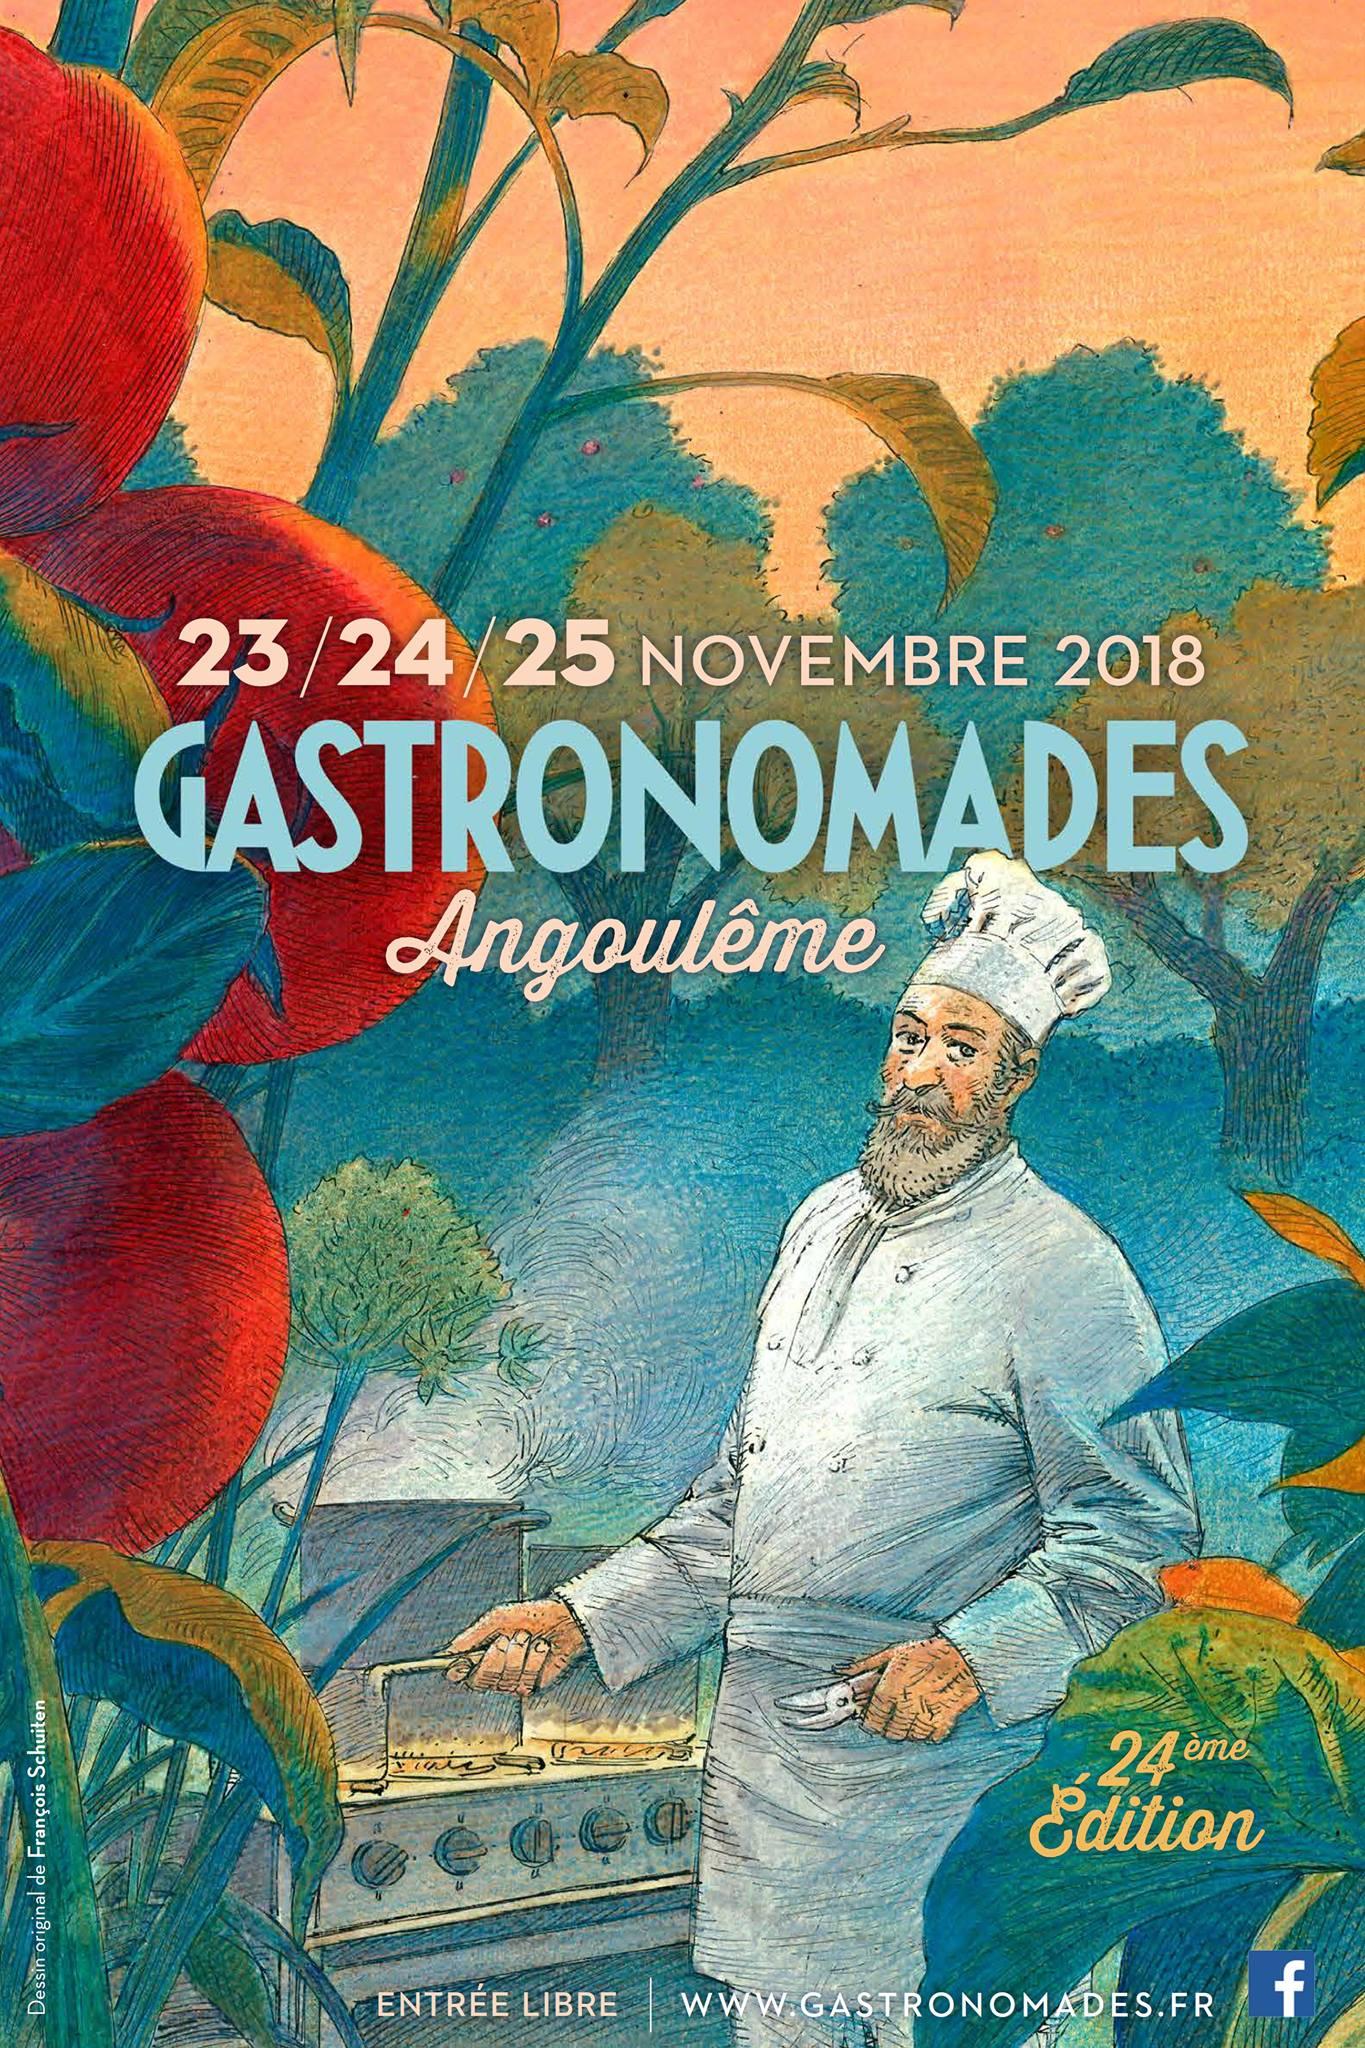 Gastronomades 2018 by François Schuiten